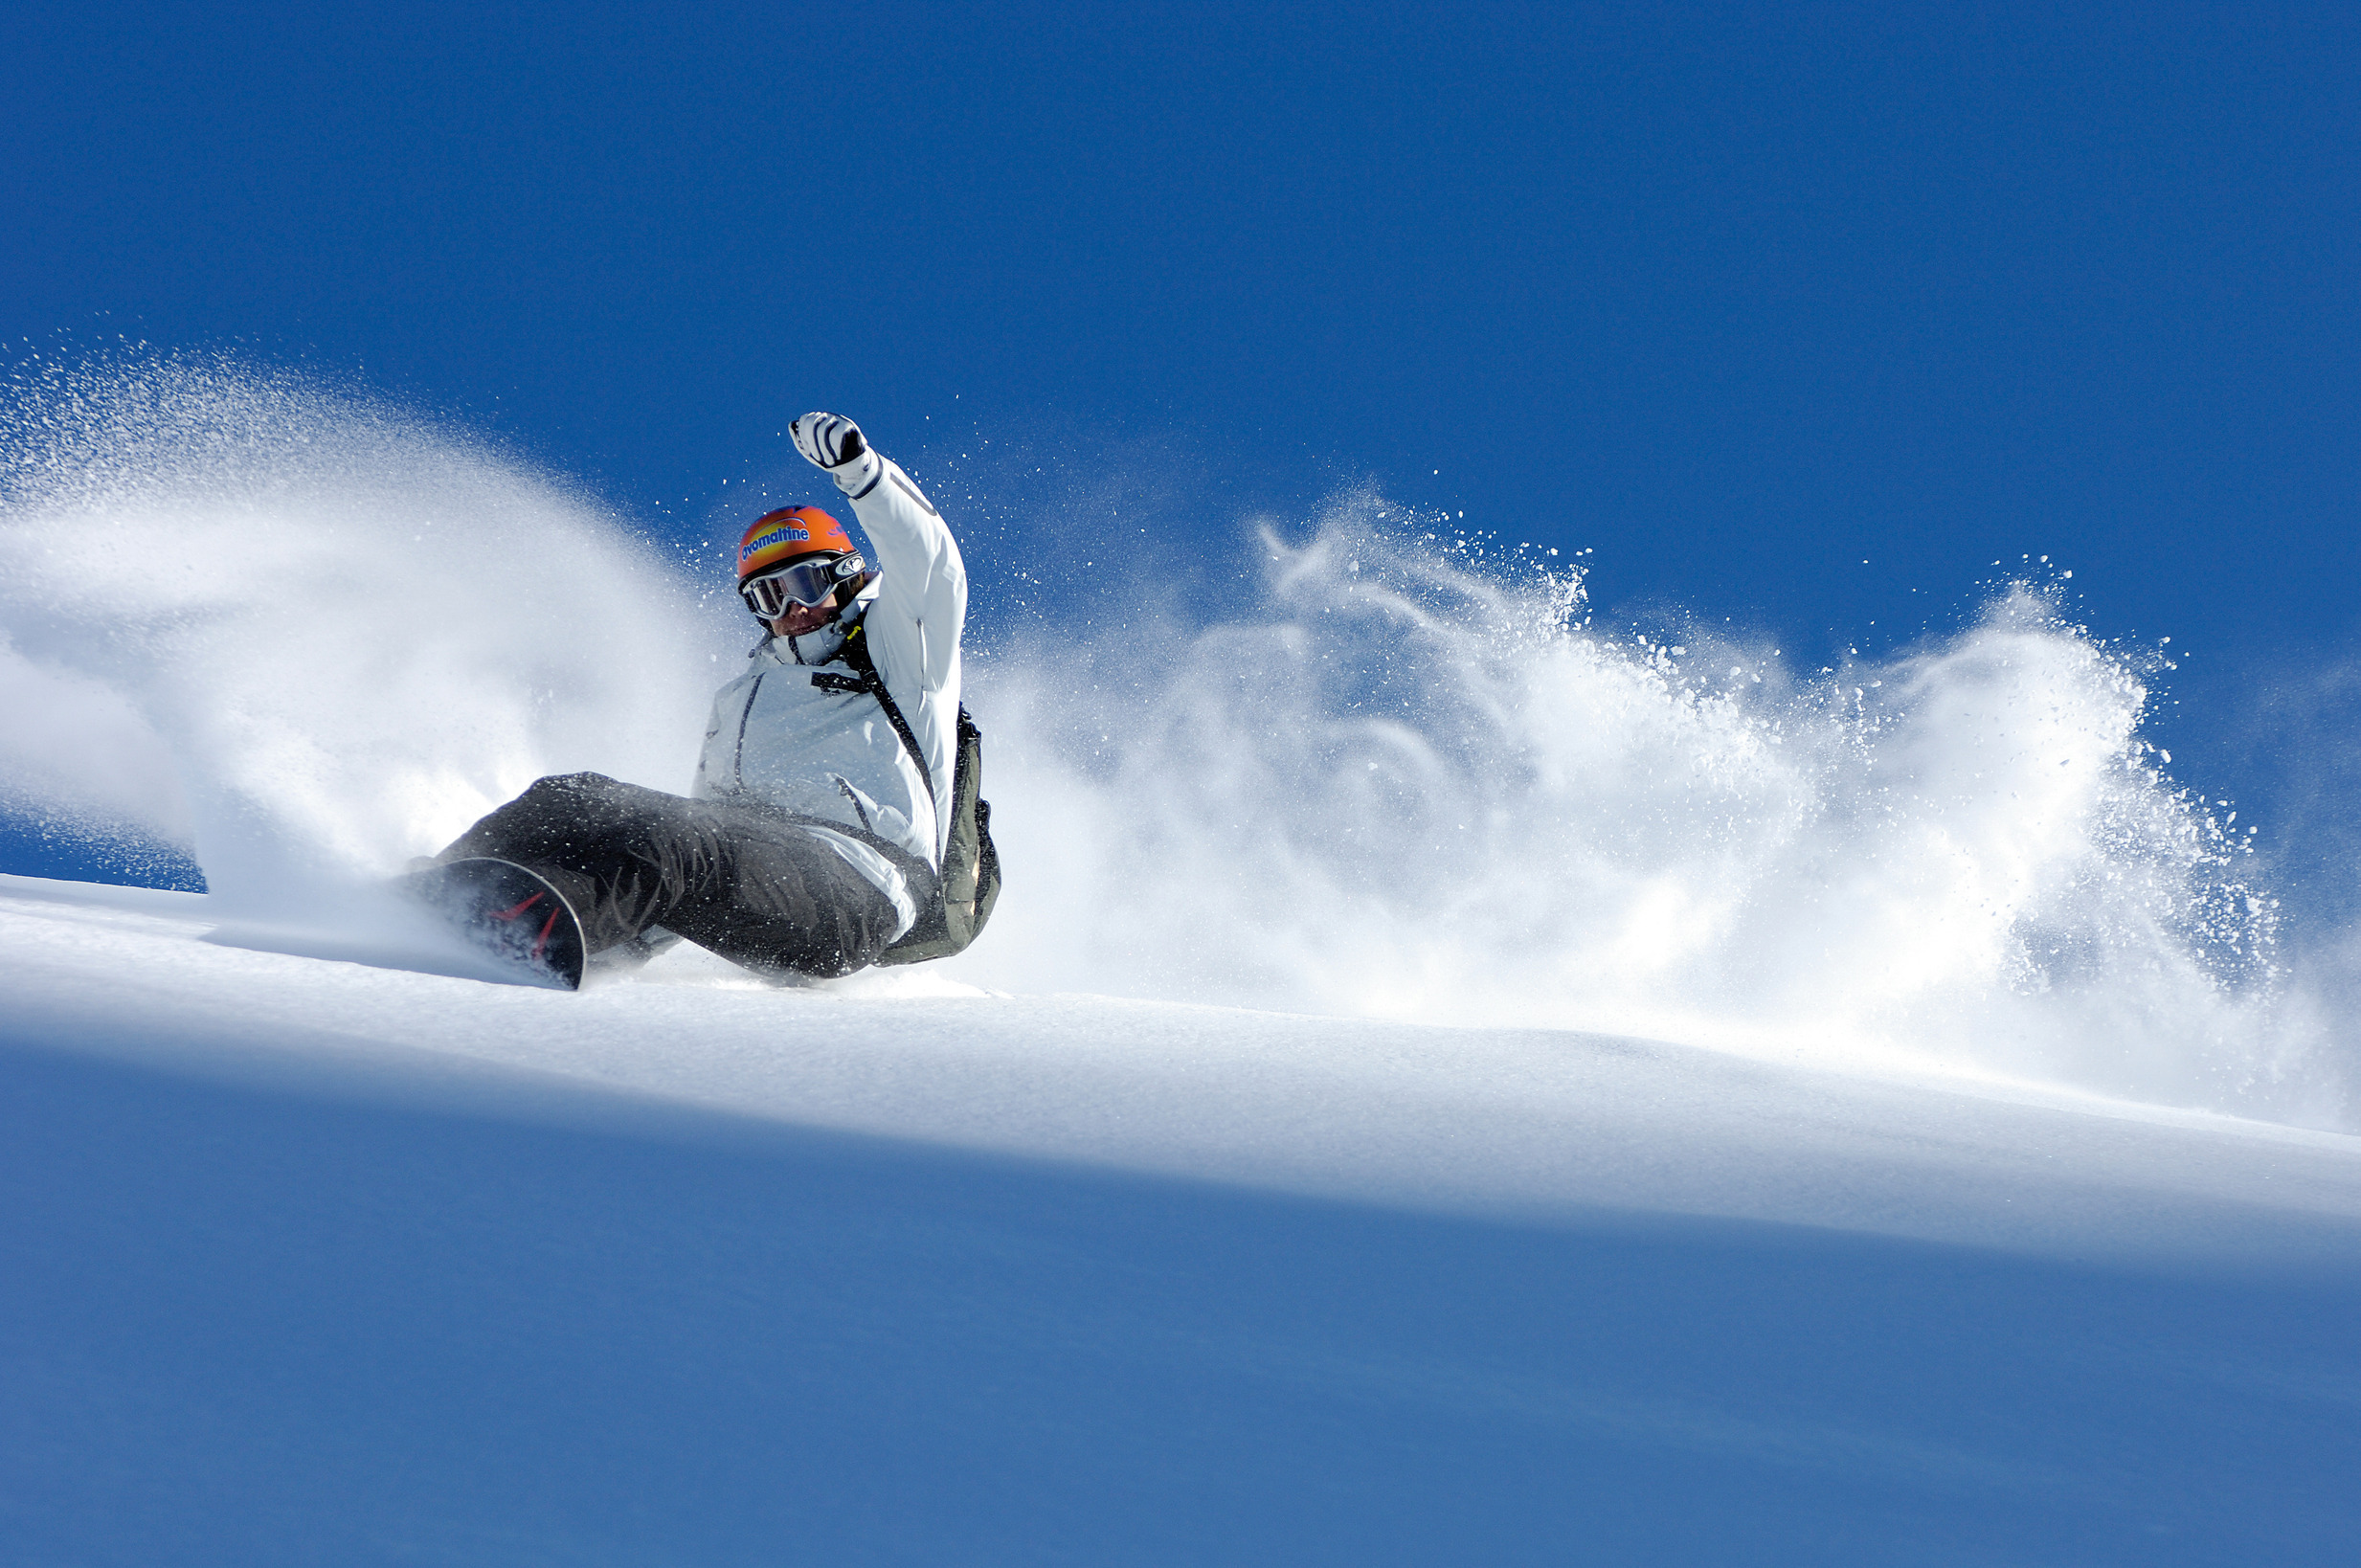 сноуборд, спортсмен, скачать фото, snowboard, wallpaper